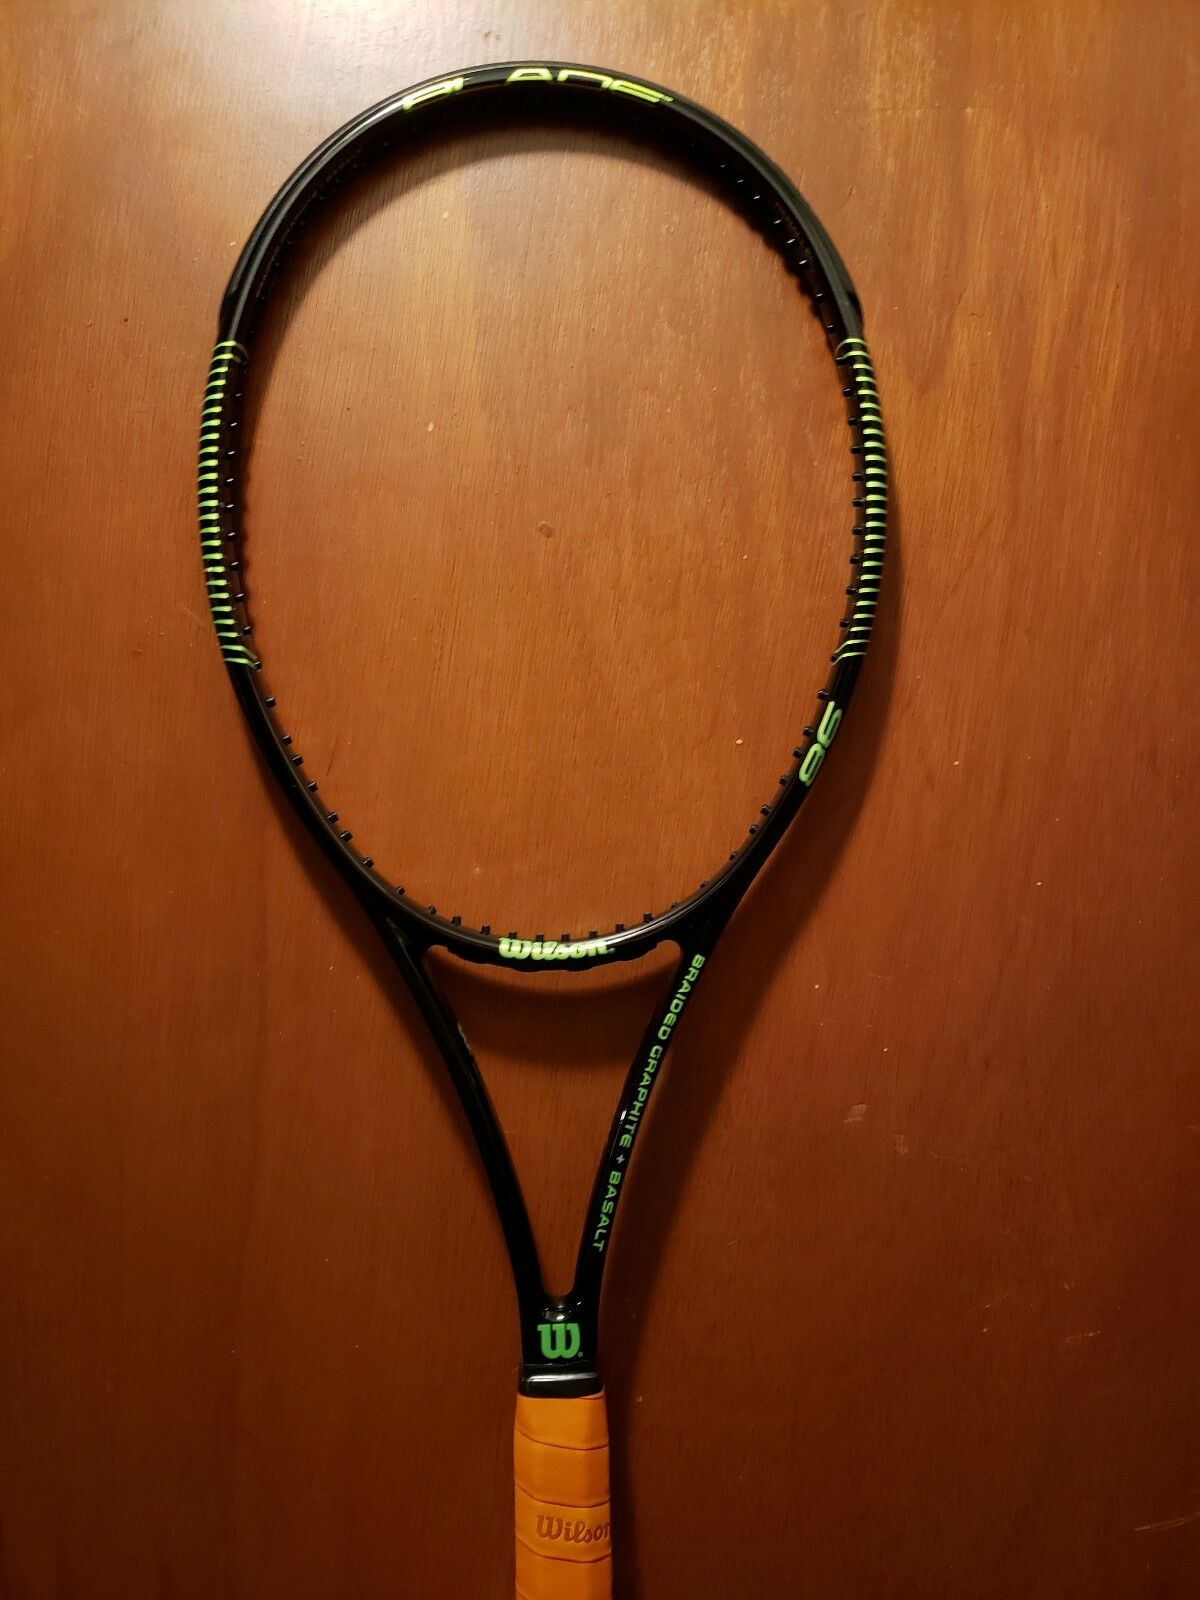 Wilson Pro Stock Blade 98 Milos Raonic 18 20 Wimbledon Final